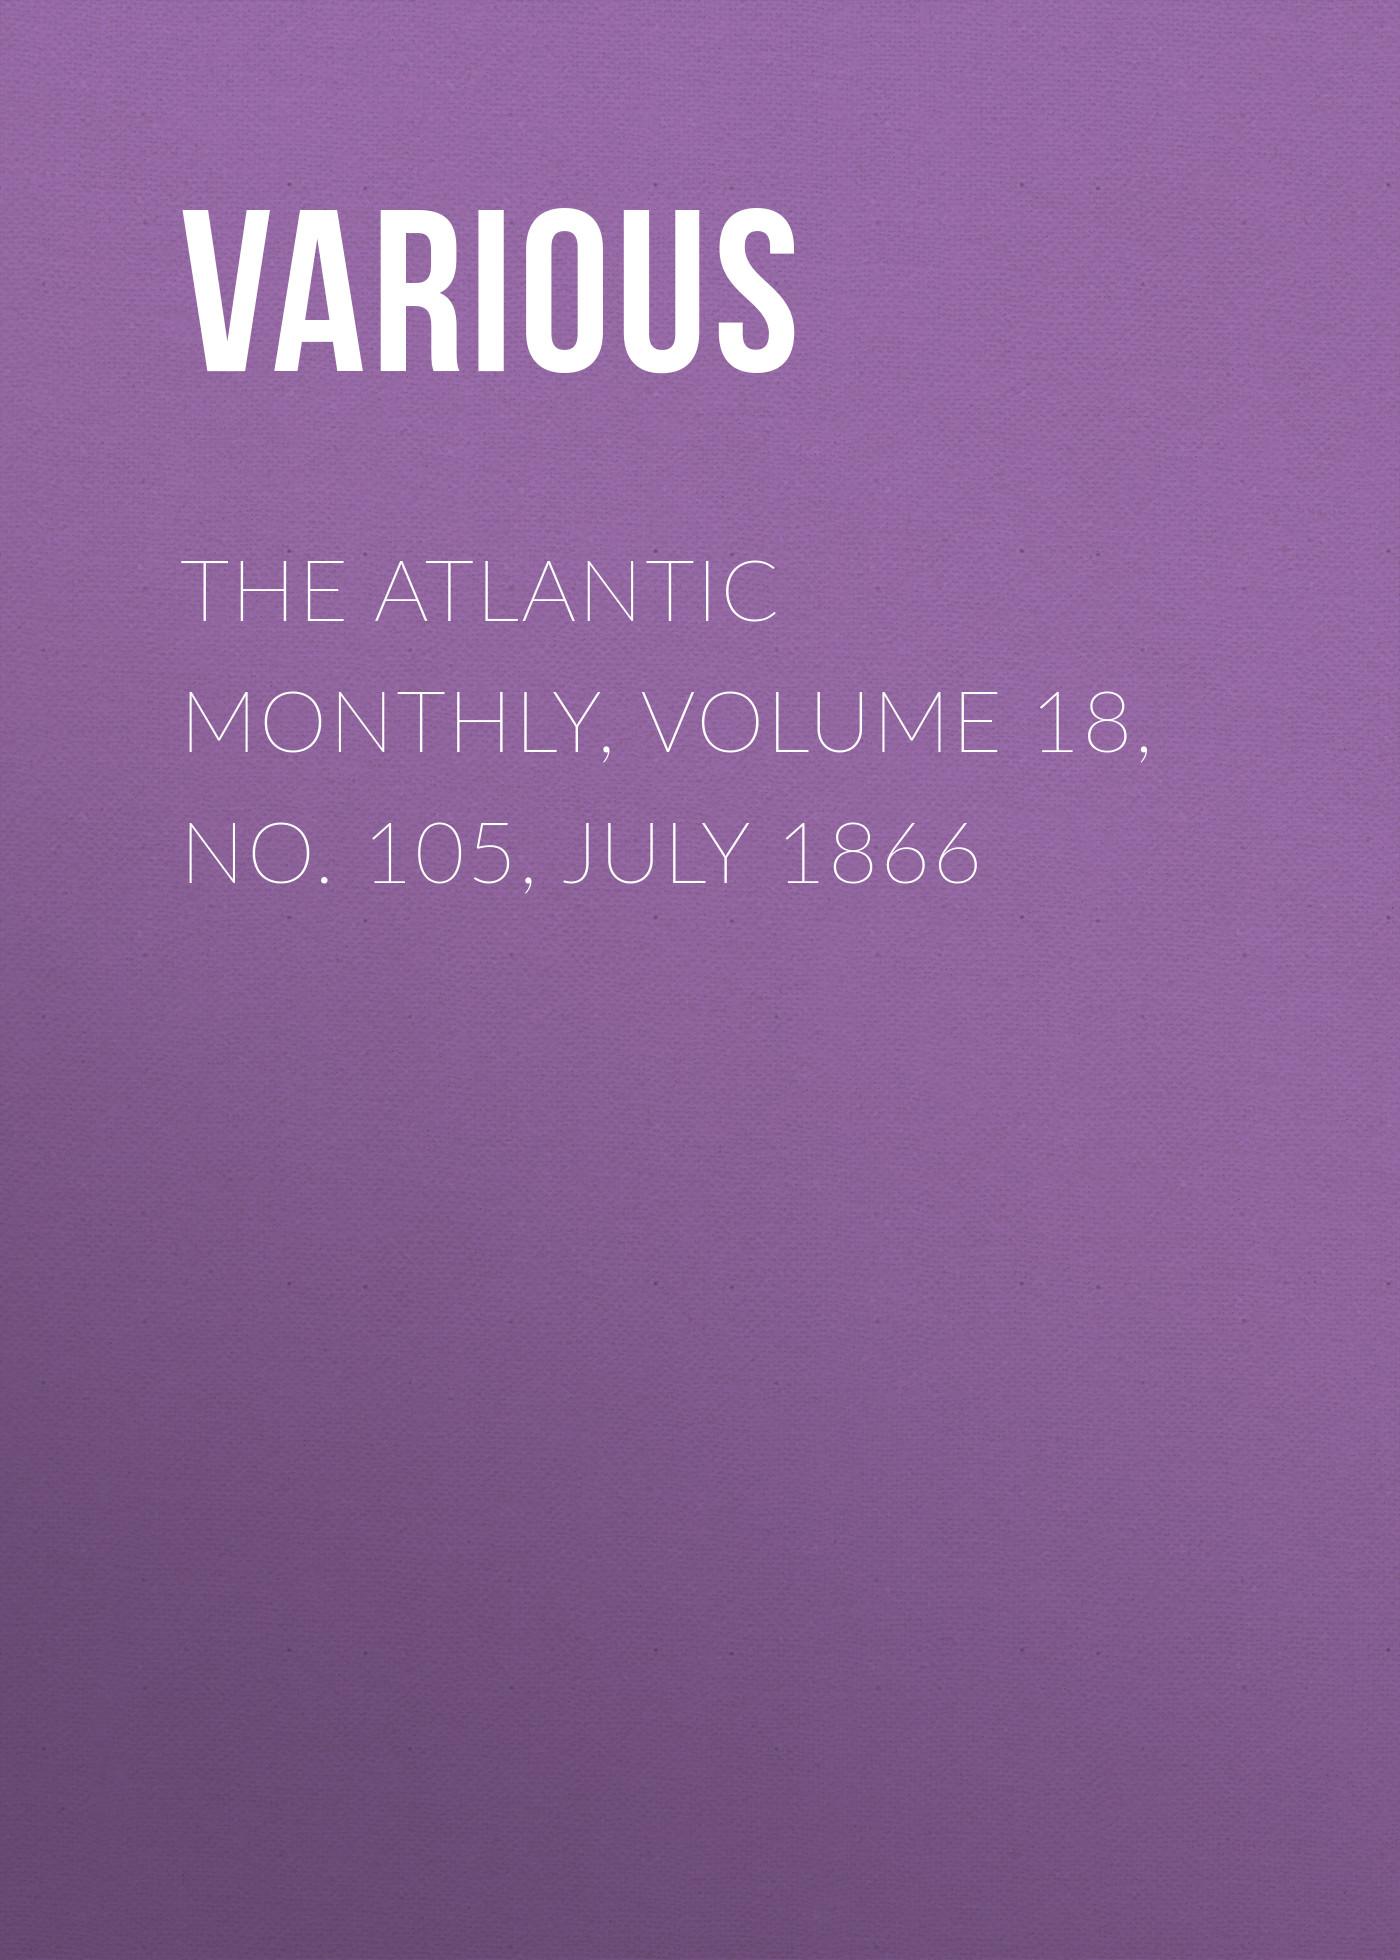 где купить Various The Atlantic Monthly, Volume 18, No. 105, July 1866 дешево